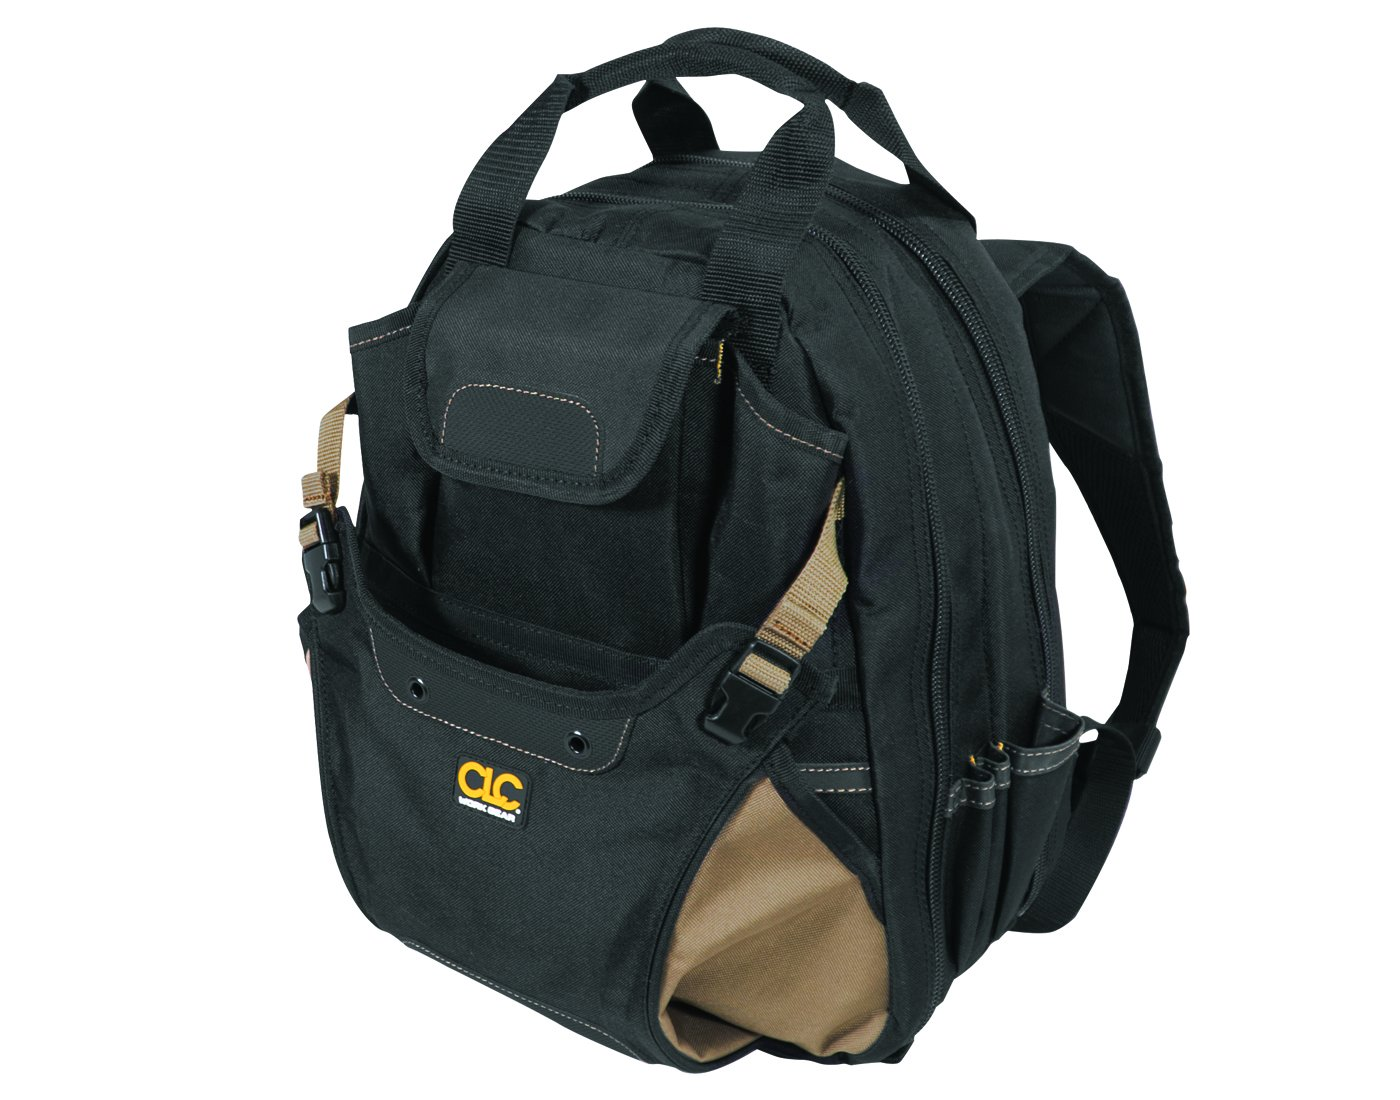 CLC Custom Leathertcraft 1134 Carpenter's Tool Backpack, 44 Pockets, Padded Back Support by Custom Leathercraft